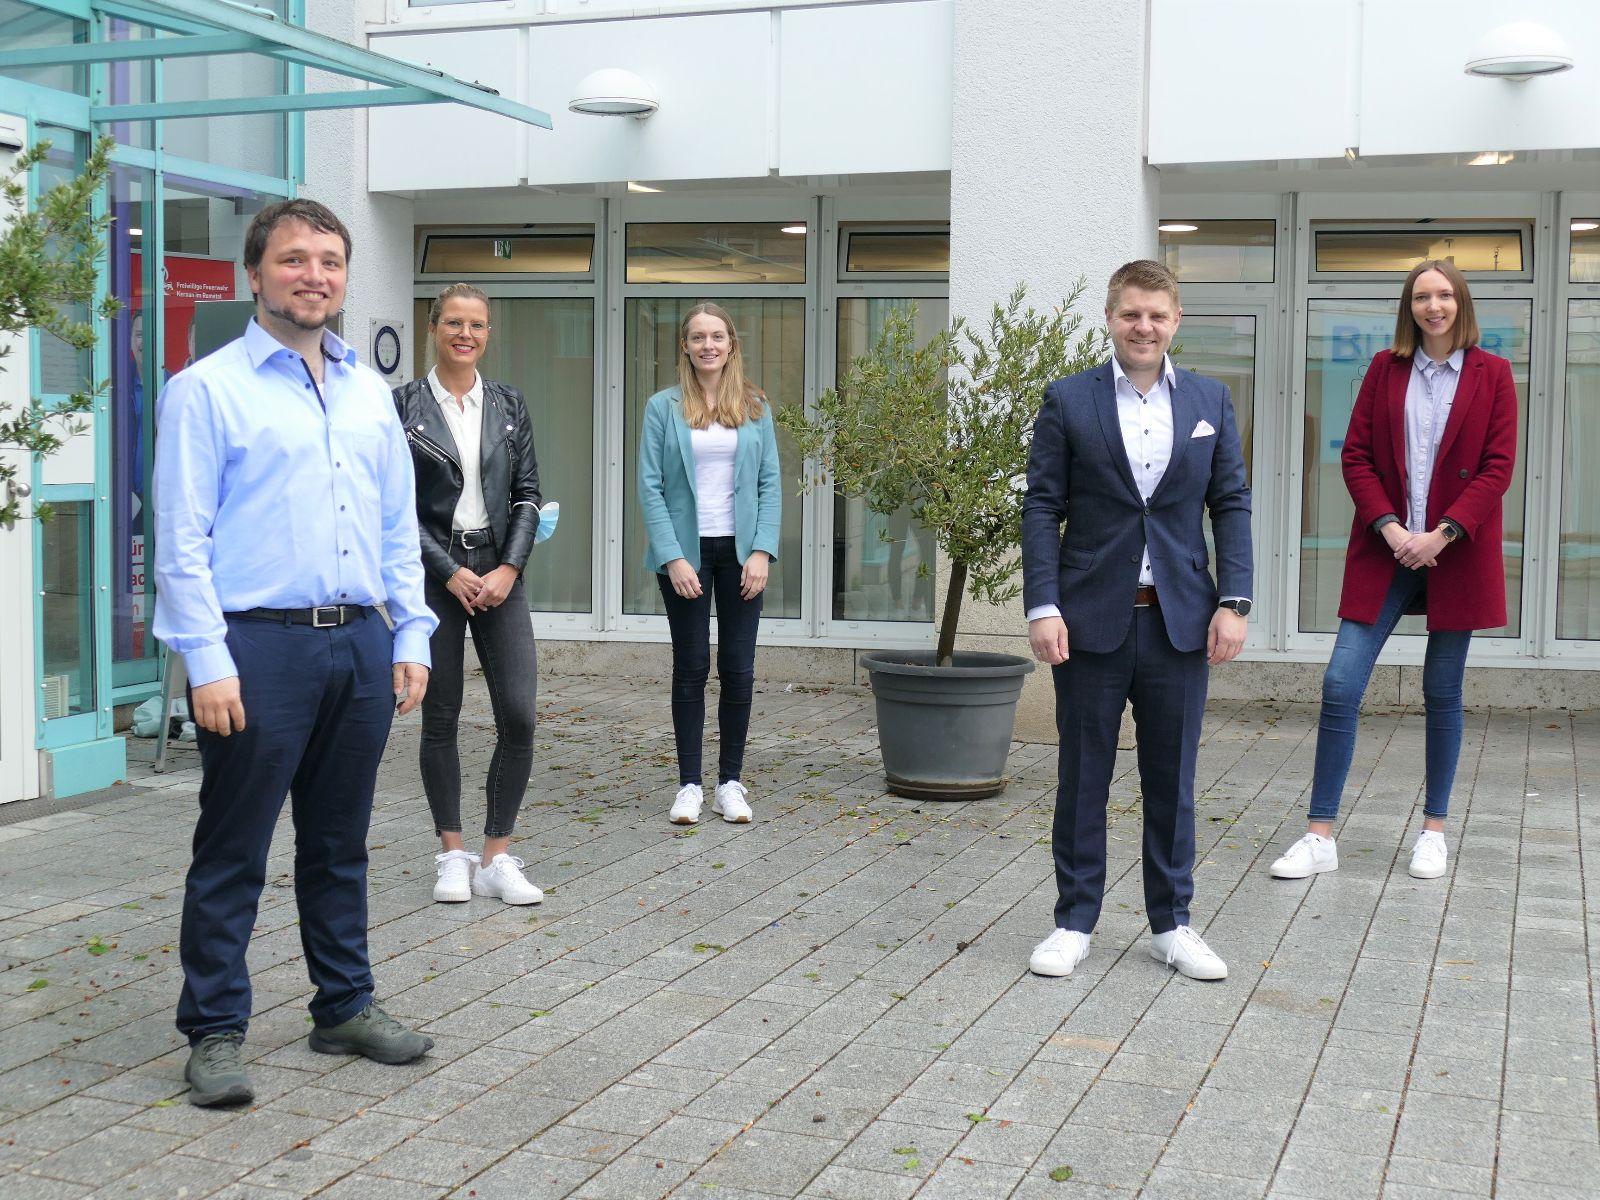 Simon Widmann, Marina Fischer, Daniela Seibold, Bürgermeister Paulowitsch und Andrea Kazik.